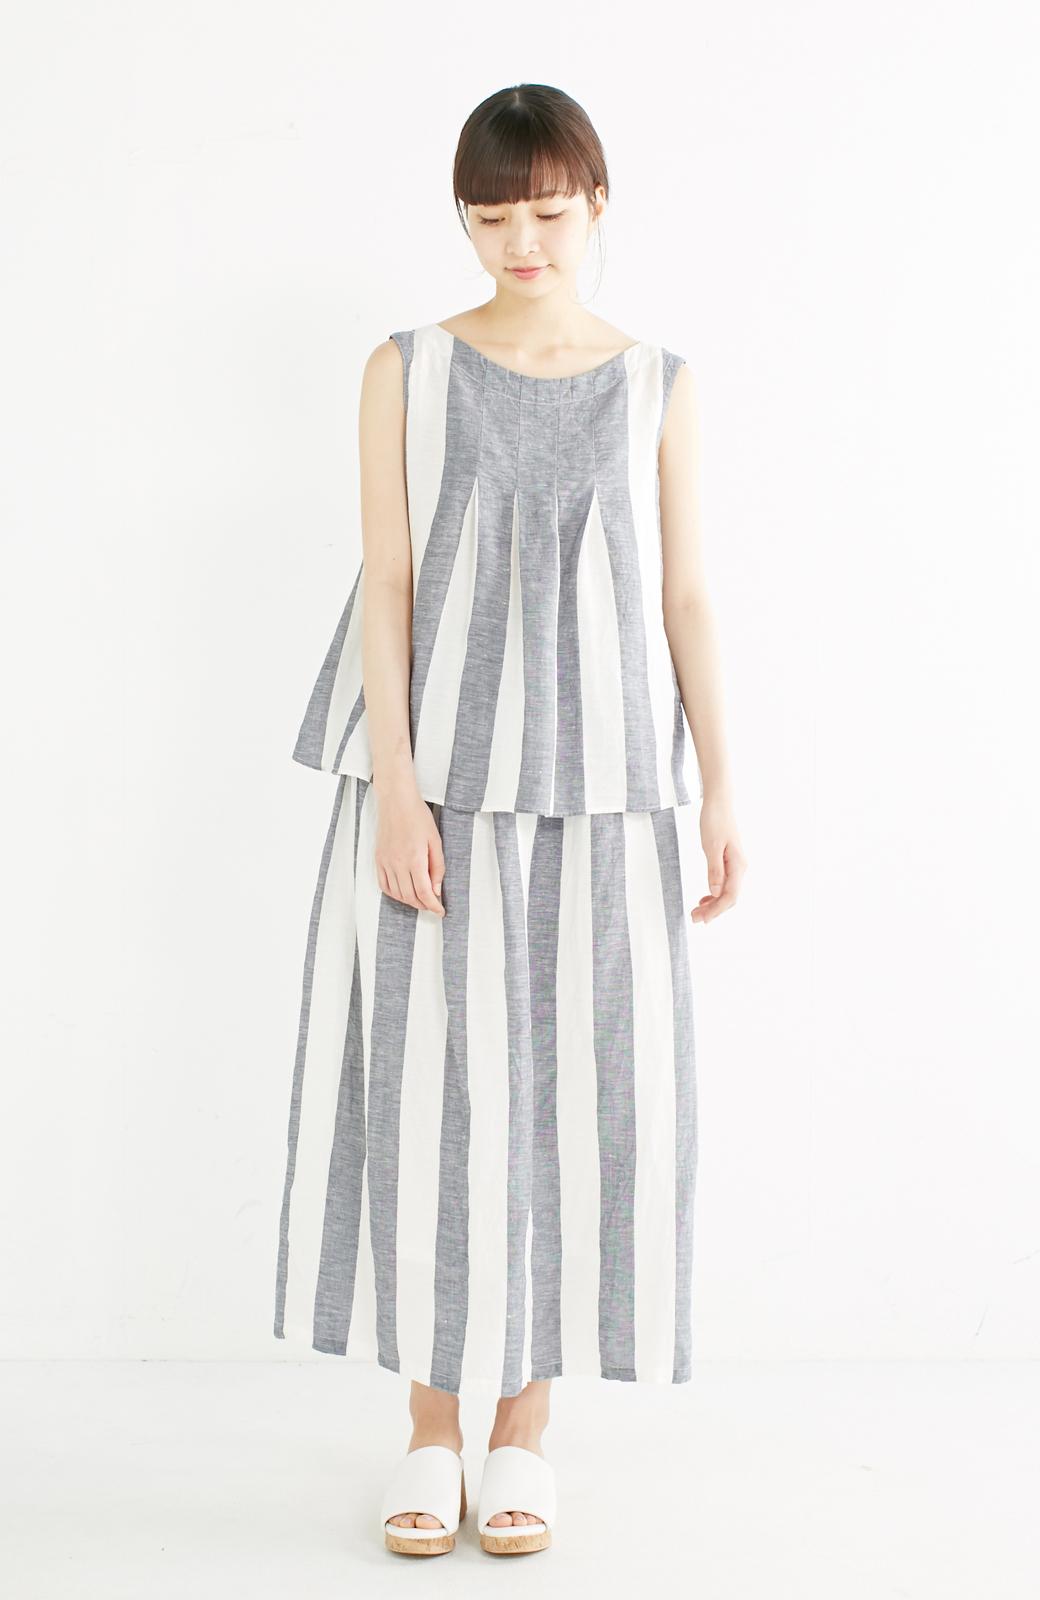 haco! てとひとて miho umezawa ストライプツーピースドレス <ホワイト×ブルー>の商品写真5